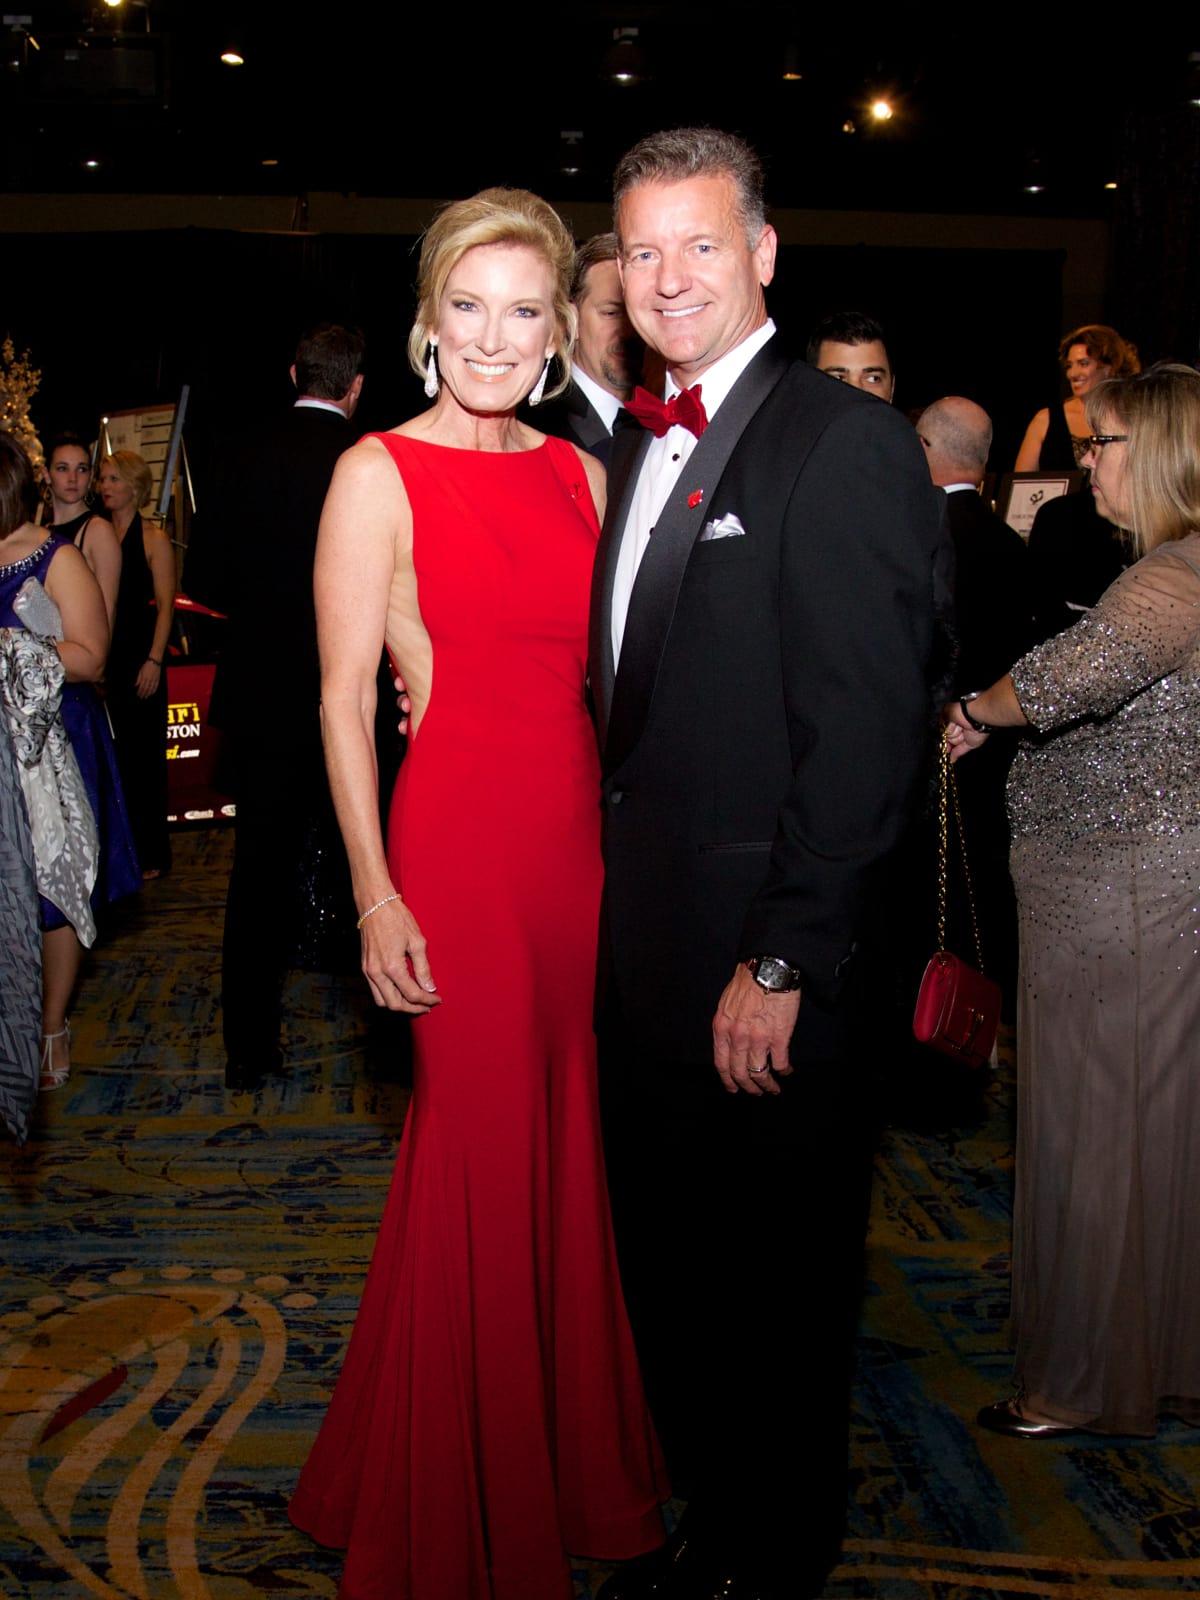 Montgomery County Heart Ball, Feb. 2016, Diane Kink, Bruce Kink